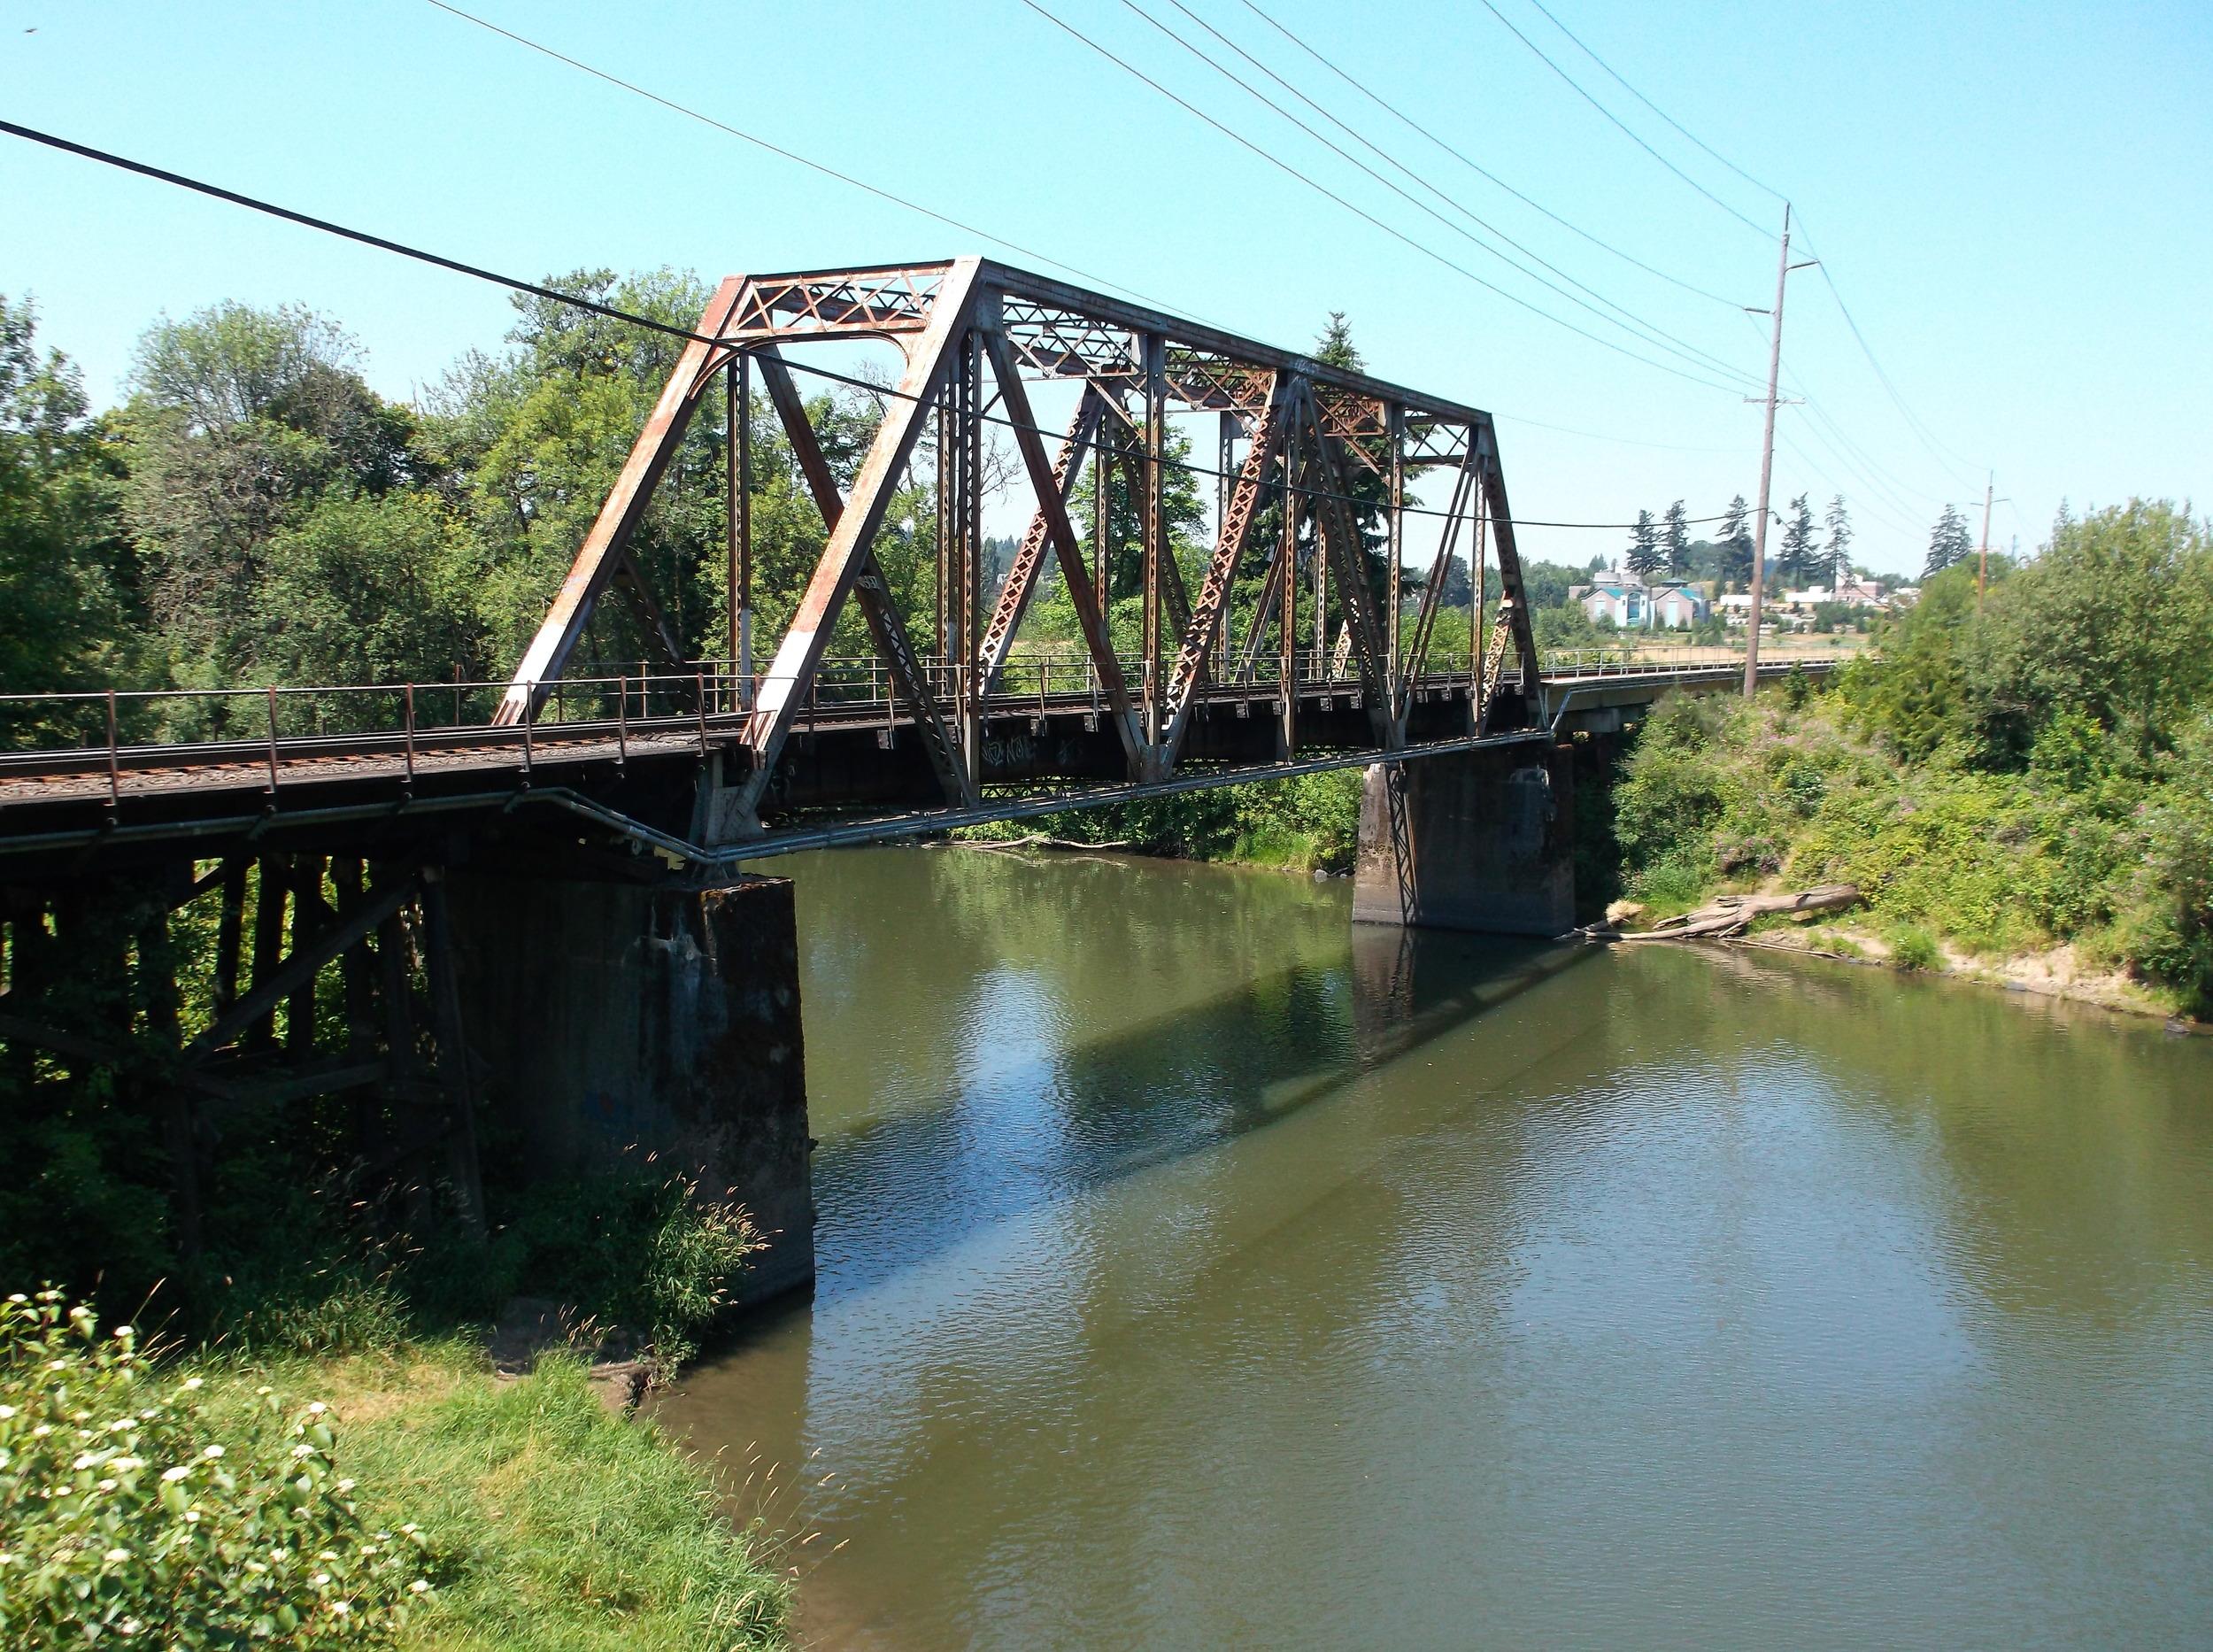 2014-7-14 B to W Rail 001.jpg